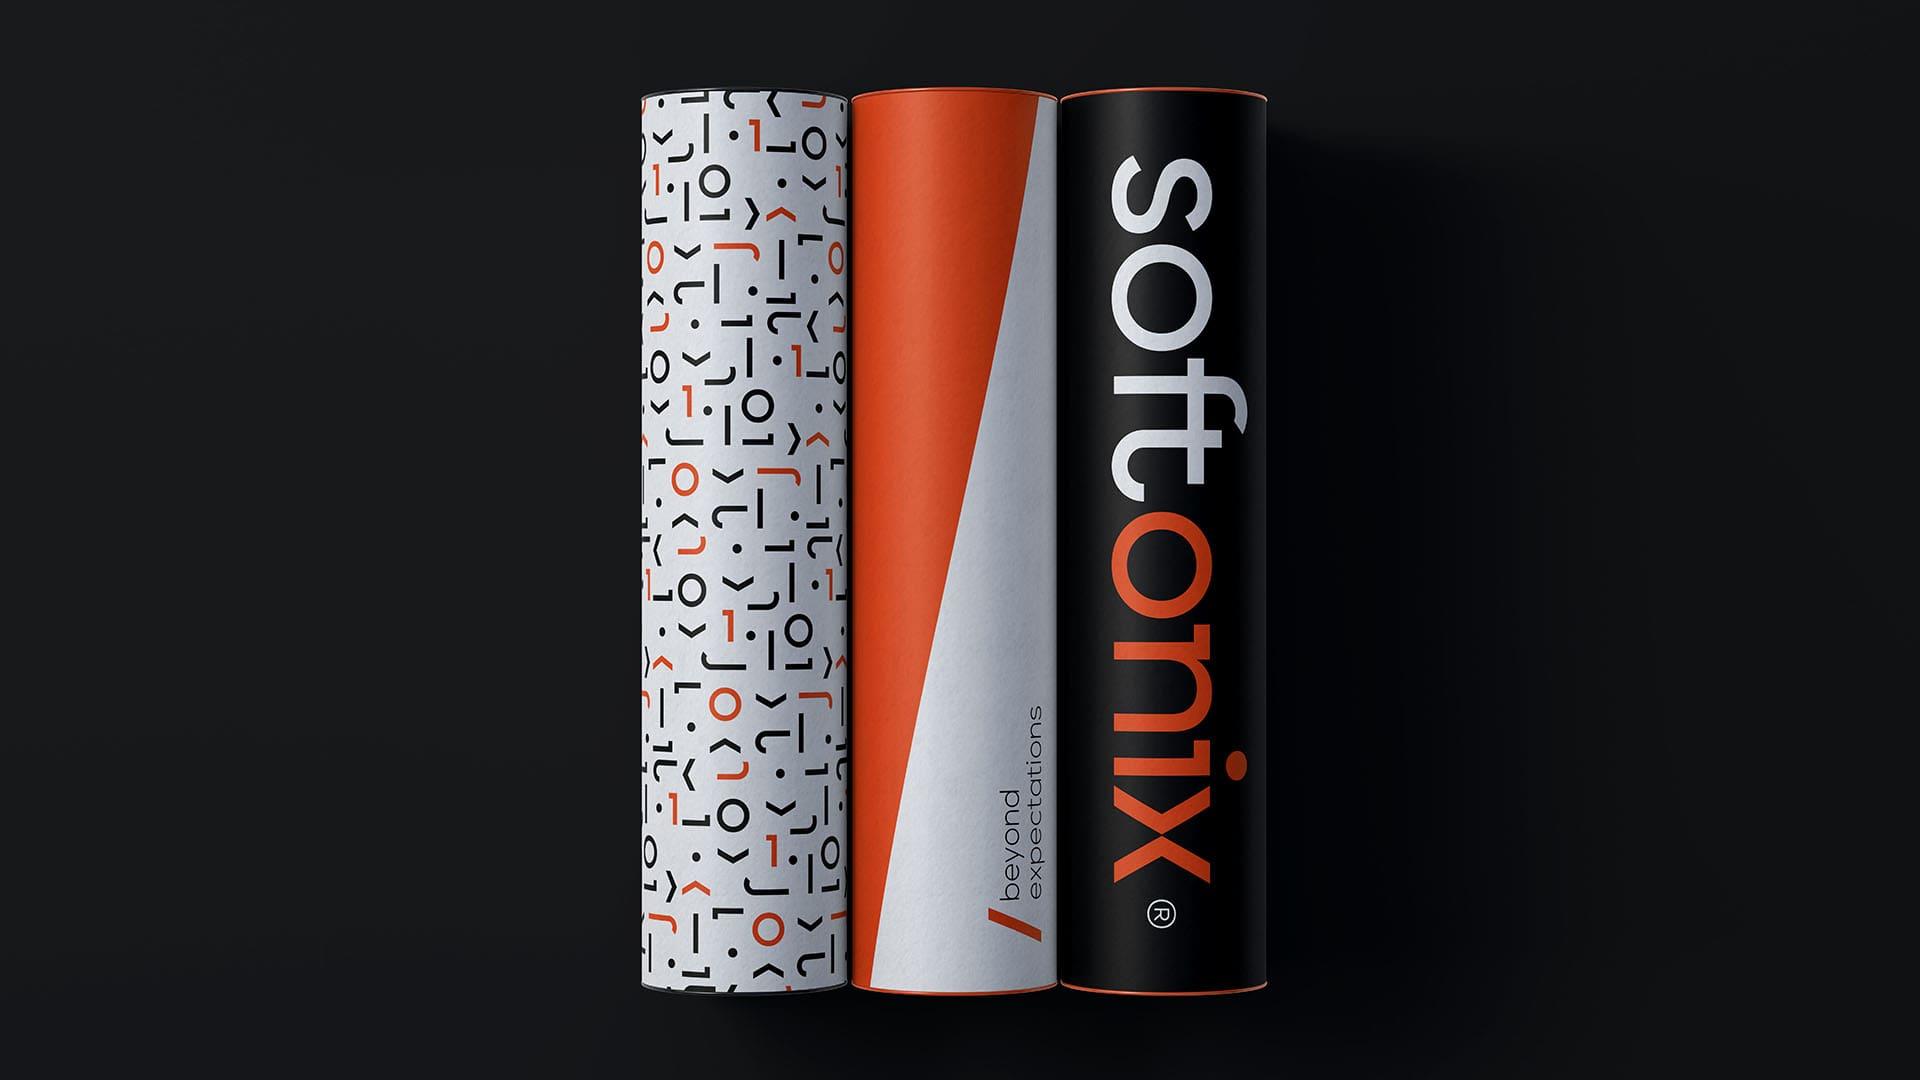 gra brand design softonix main